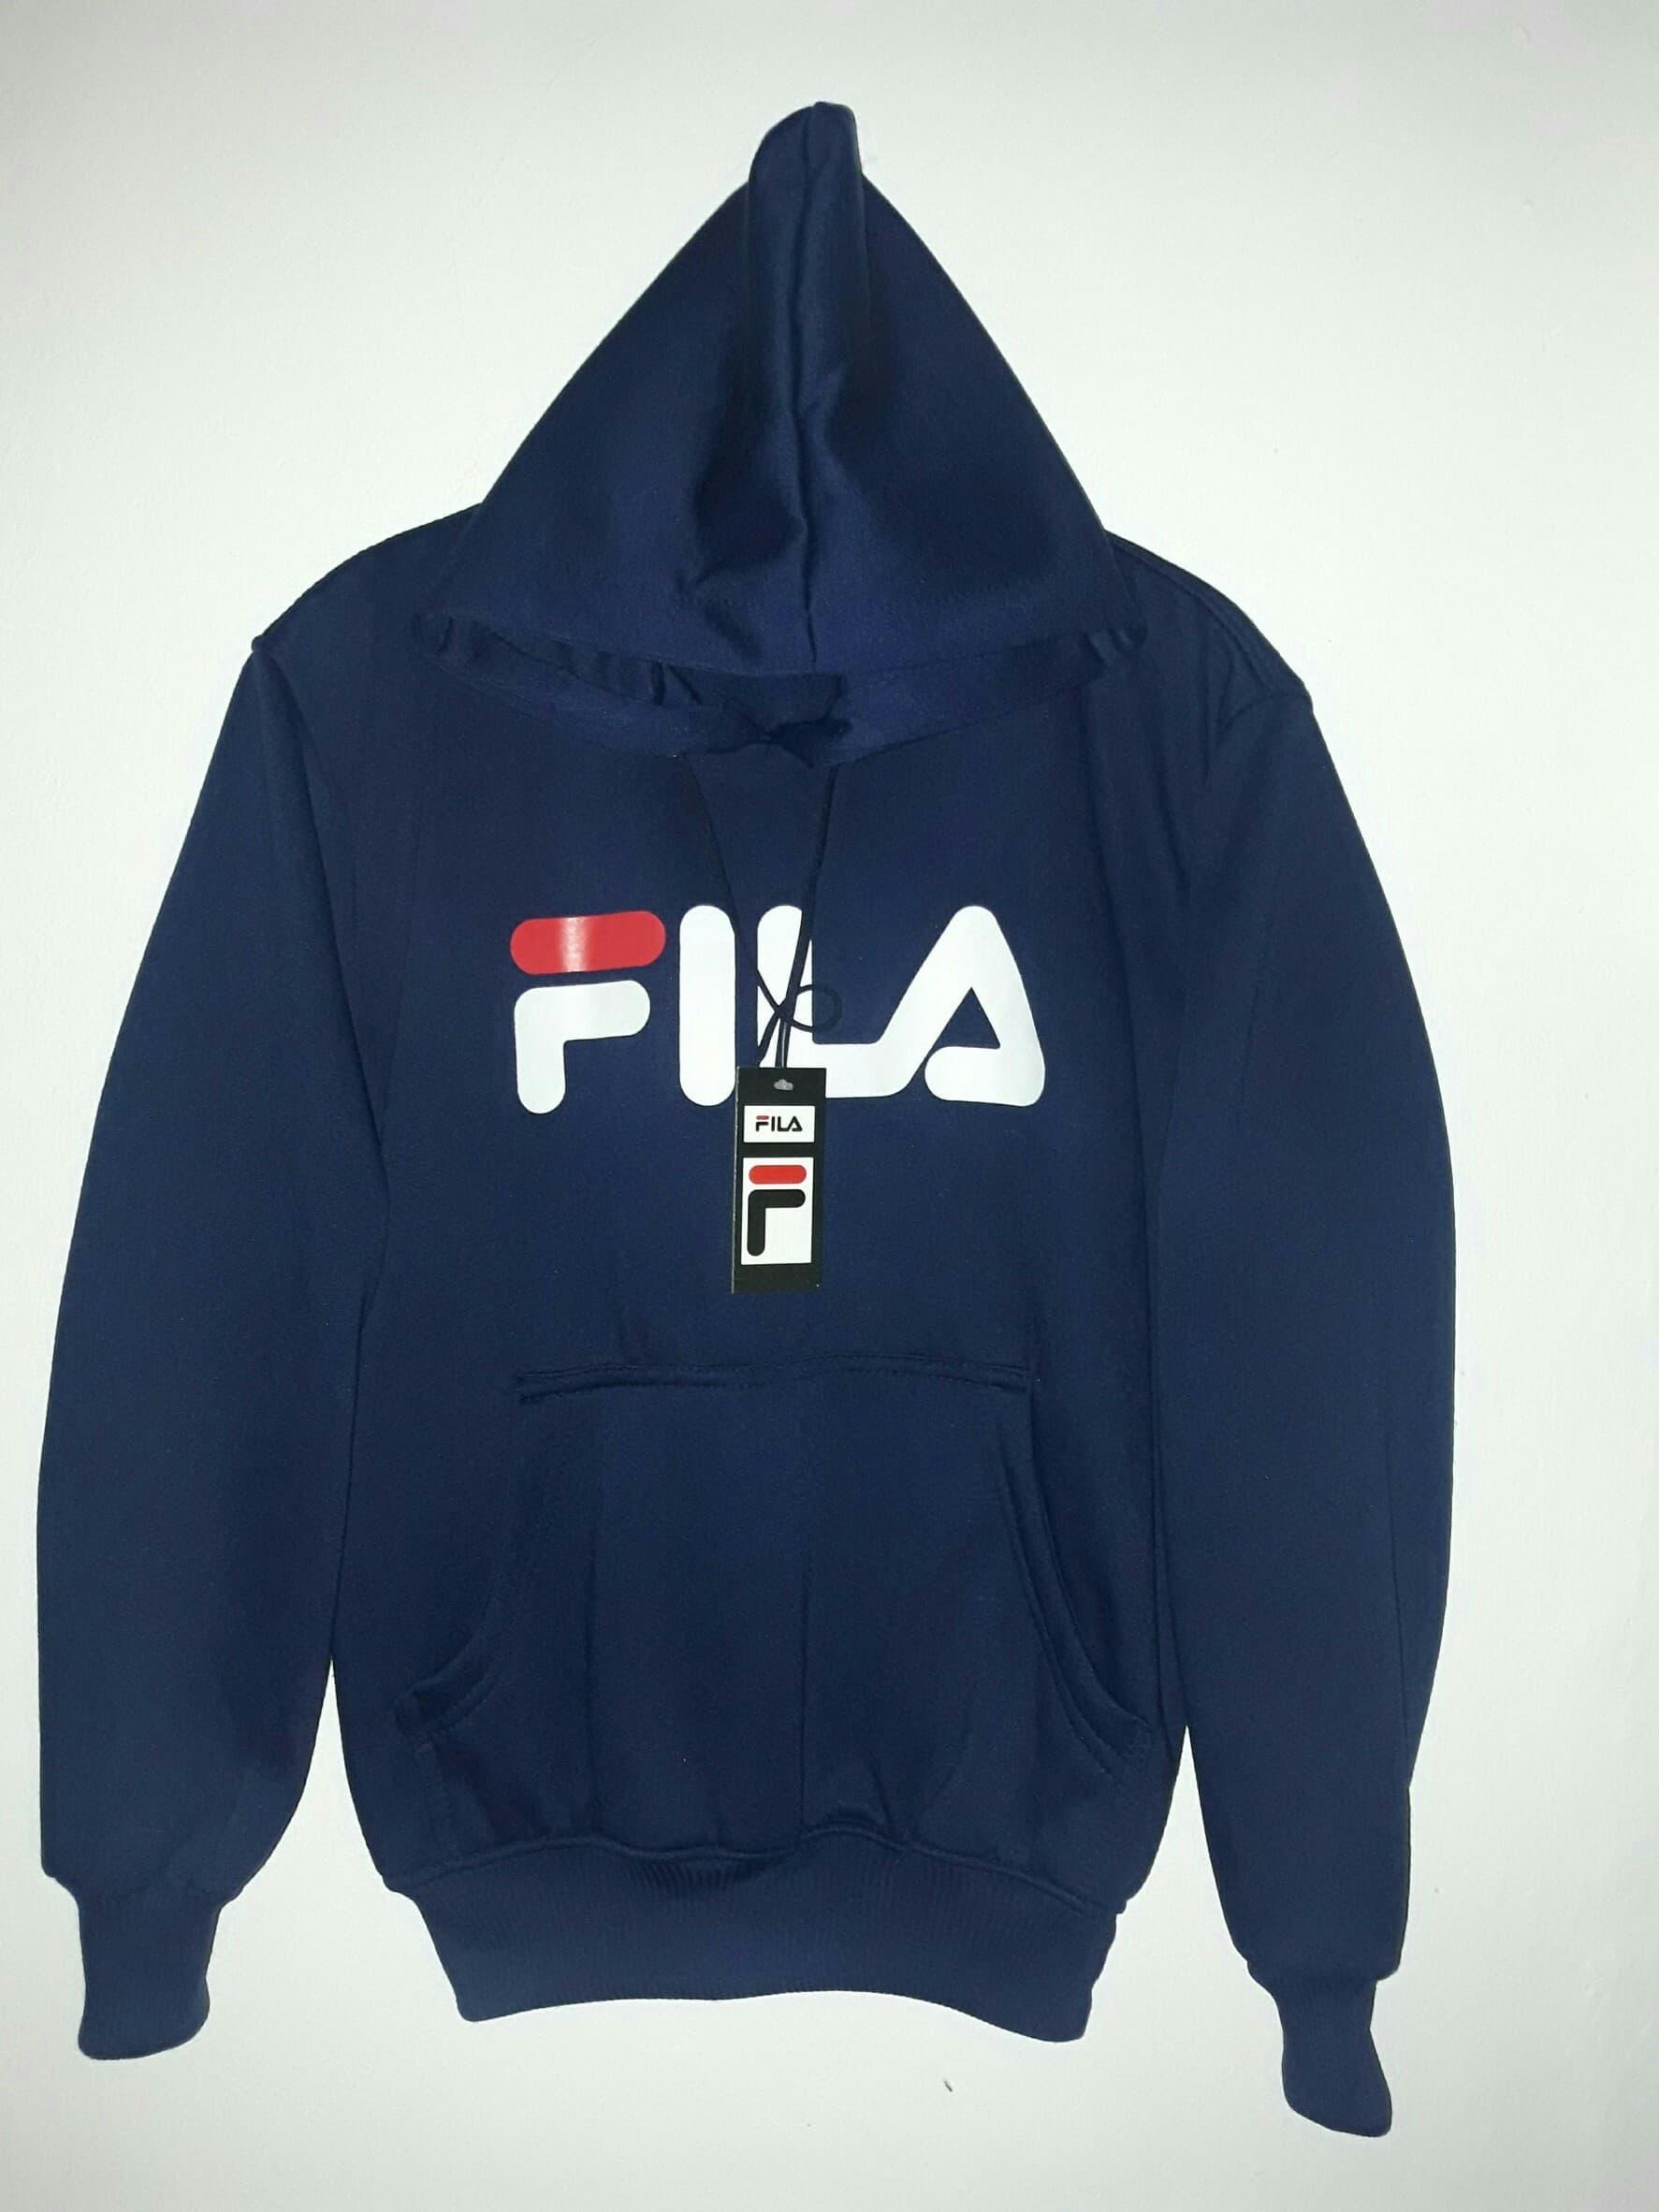 Jual jaket pria biru fila - sweater navy hoodie distro fila bandung ... 263356a042